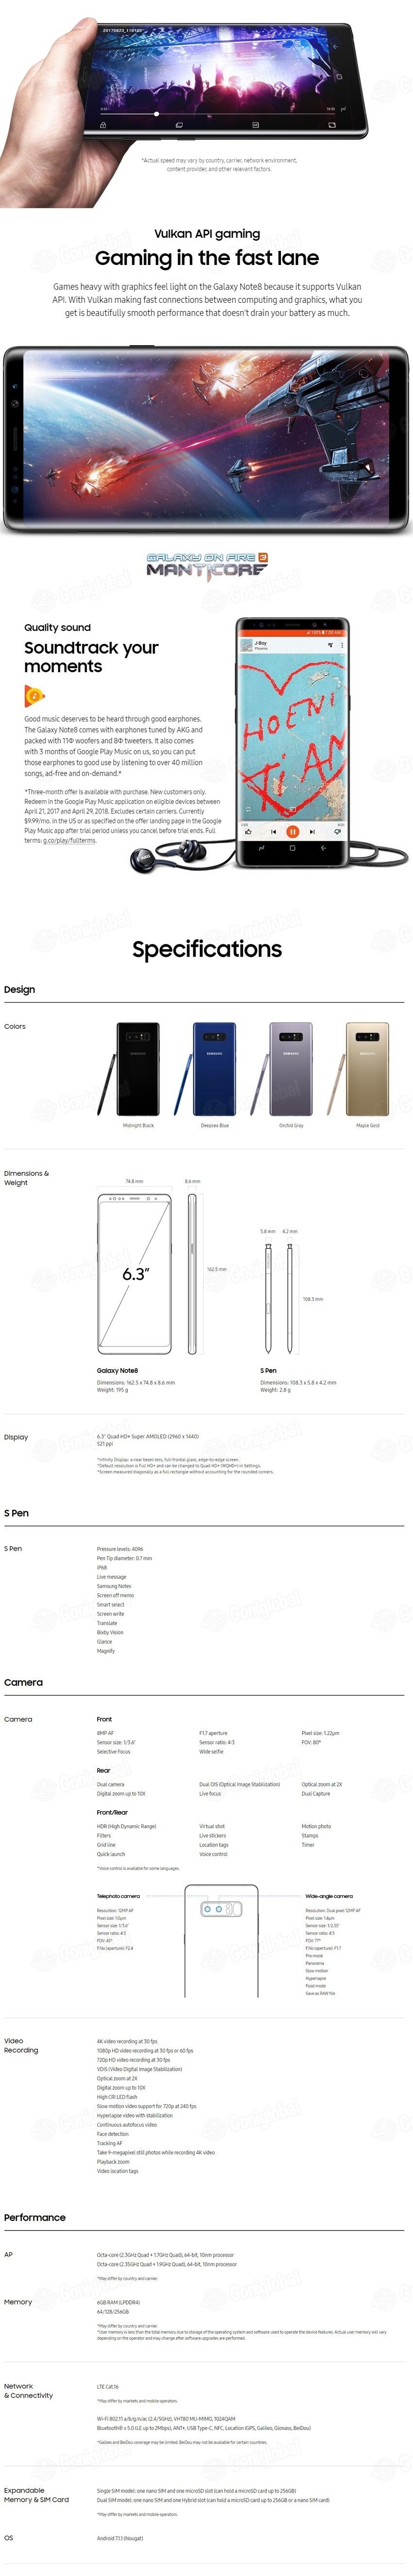 SAMSUNG Galaxy Note 8 /256GB/SM-N950/ Black Brand new original/Made in  Korea - intl